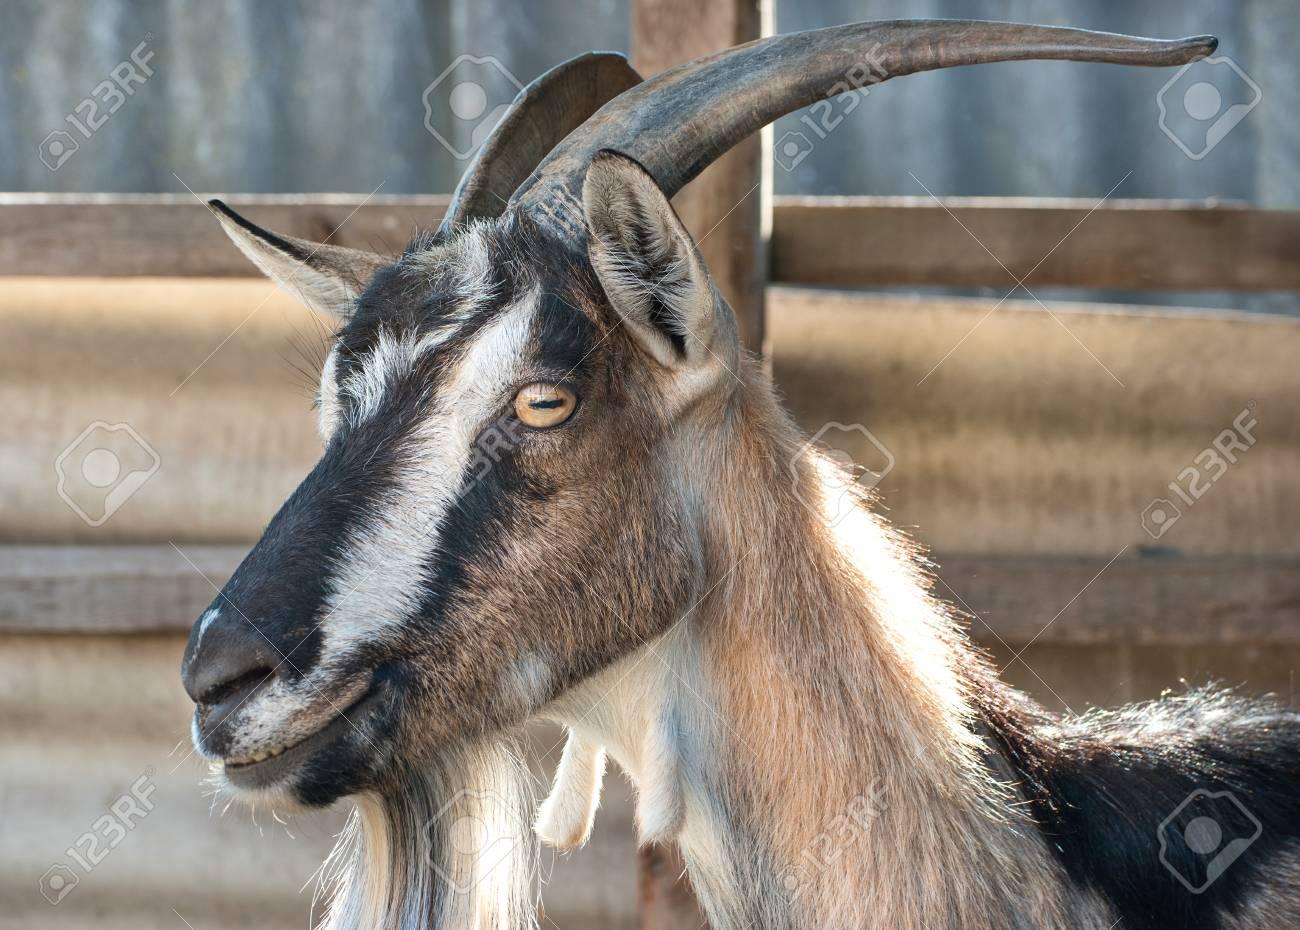 Portrait of a beautiful Alpine goat breed closeup